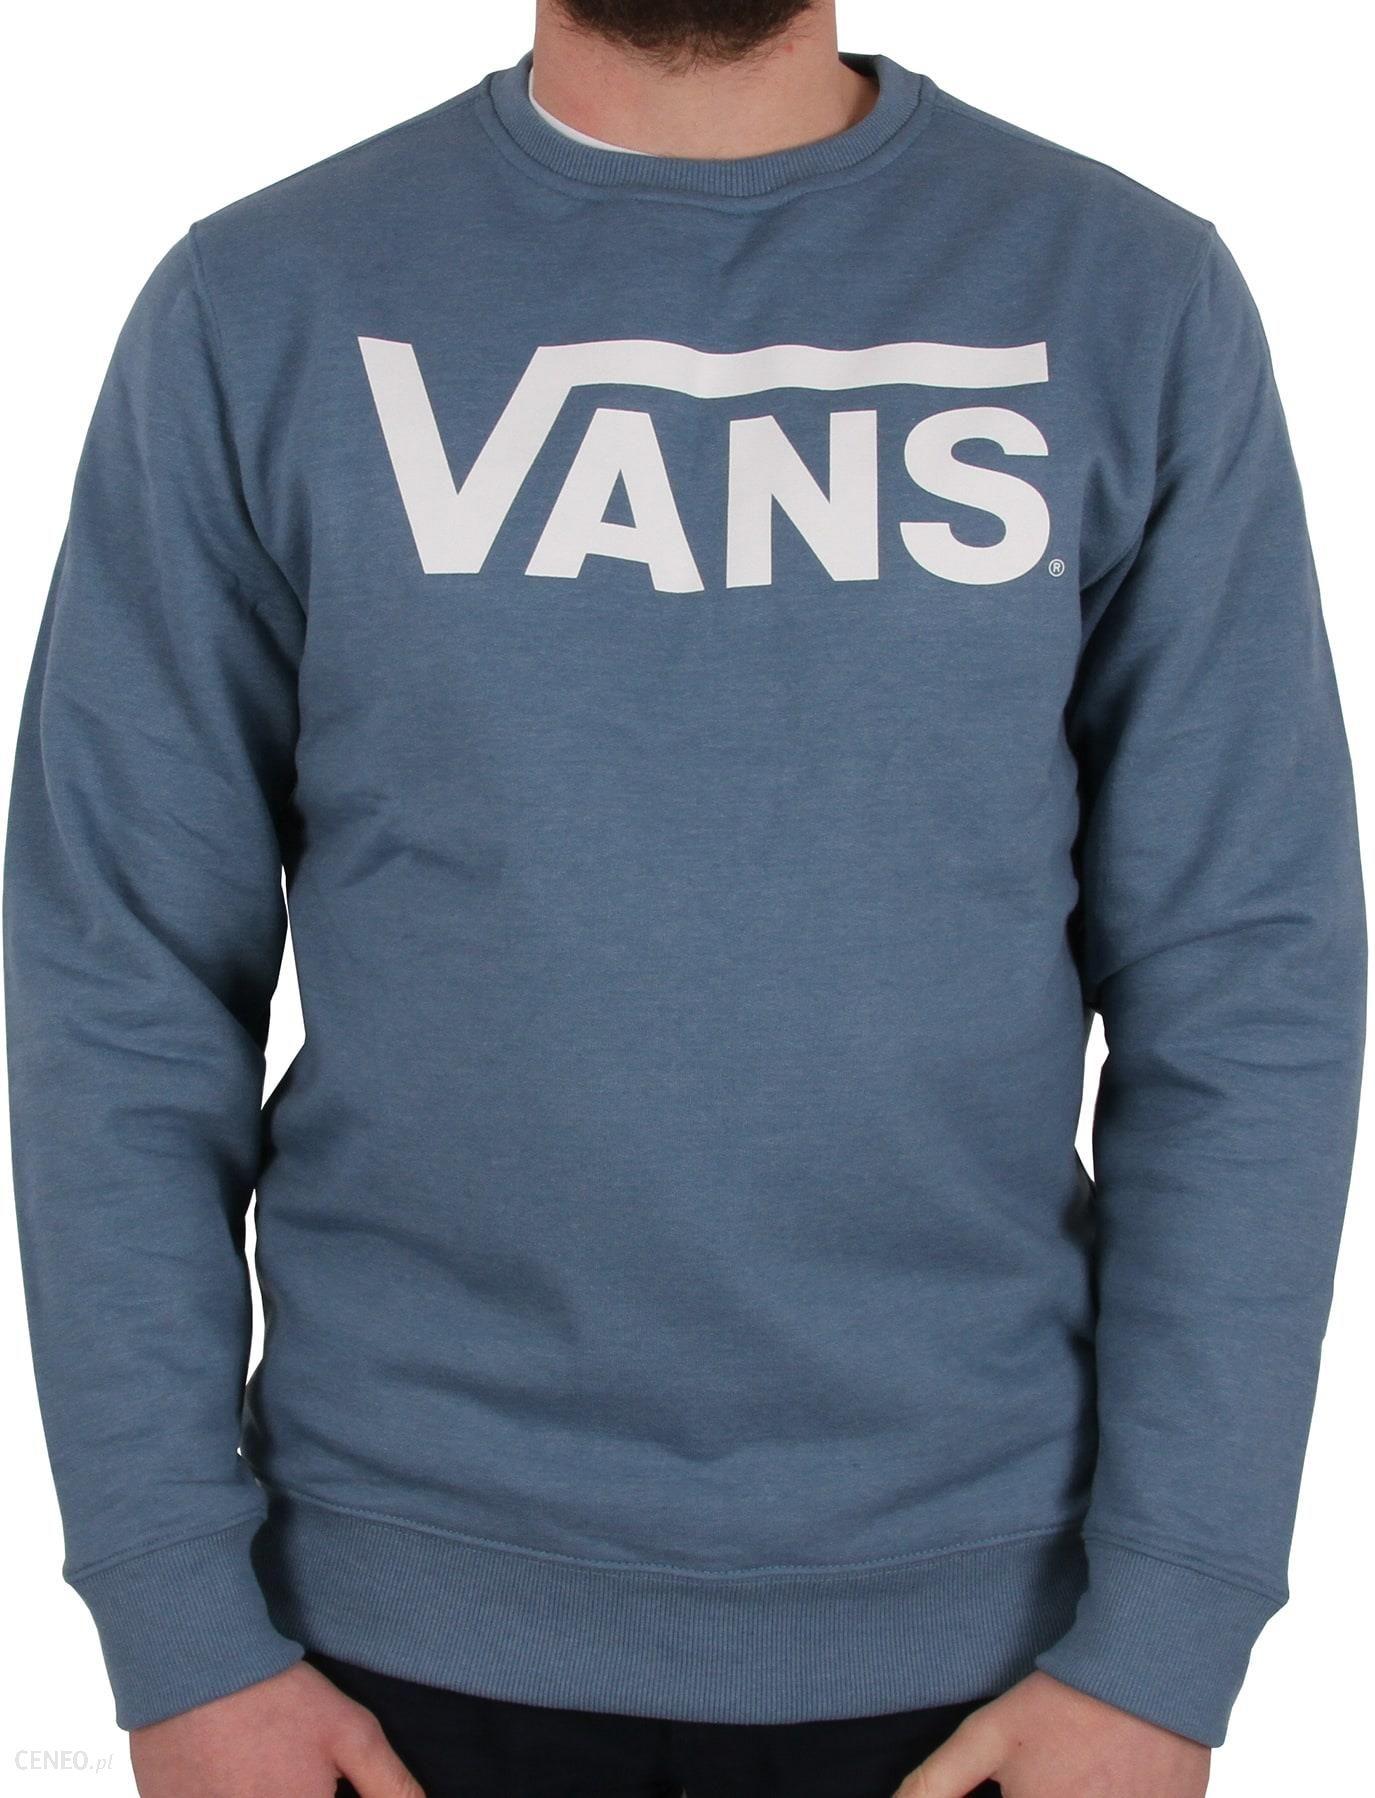 Vans Classic Crew Neck Sweater - Copen Blue Heather White - zdjęcie 1 018451252a